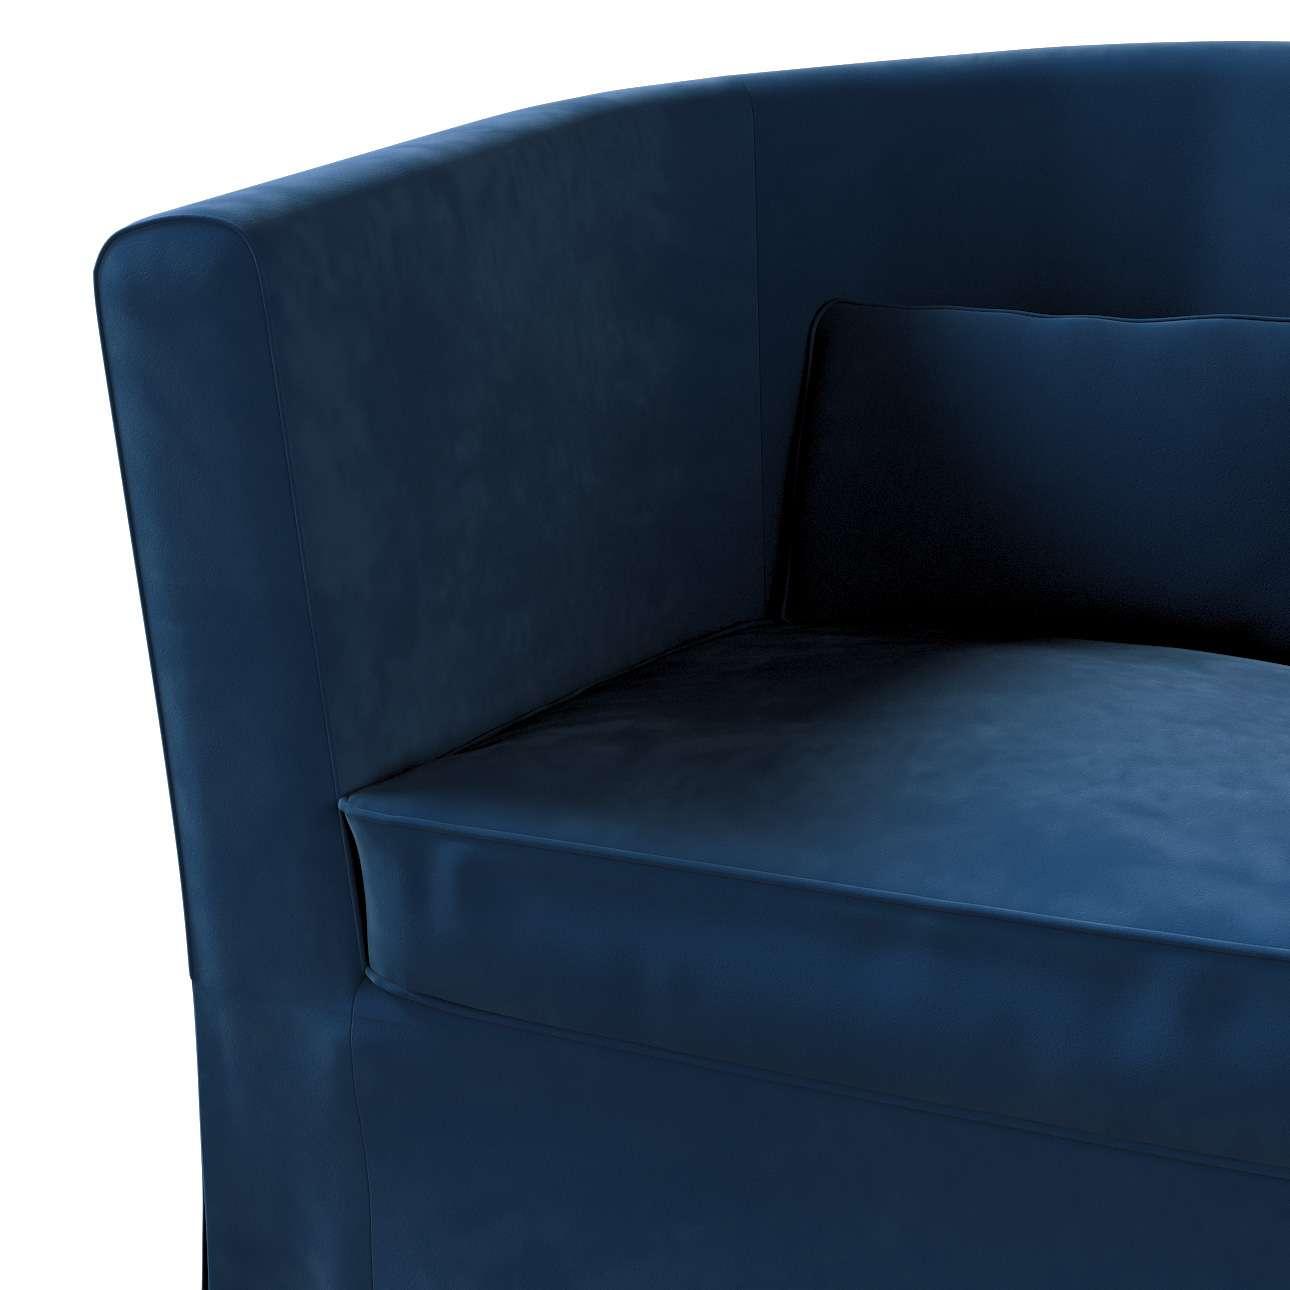 Pokrowiec na fotel Ektorp Tullsta w kolekcji Velvet, tkanina: 704-29